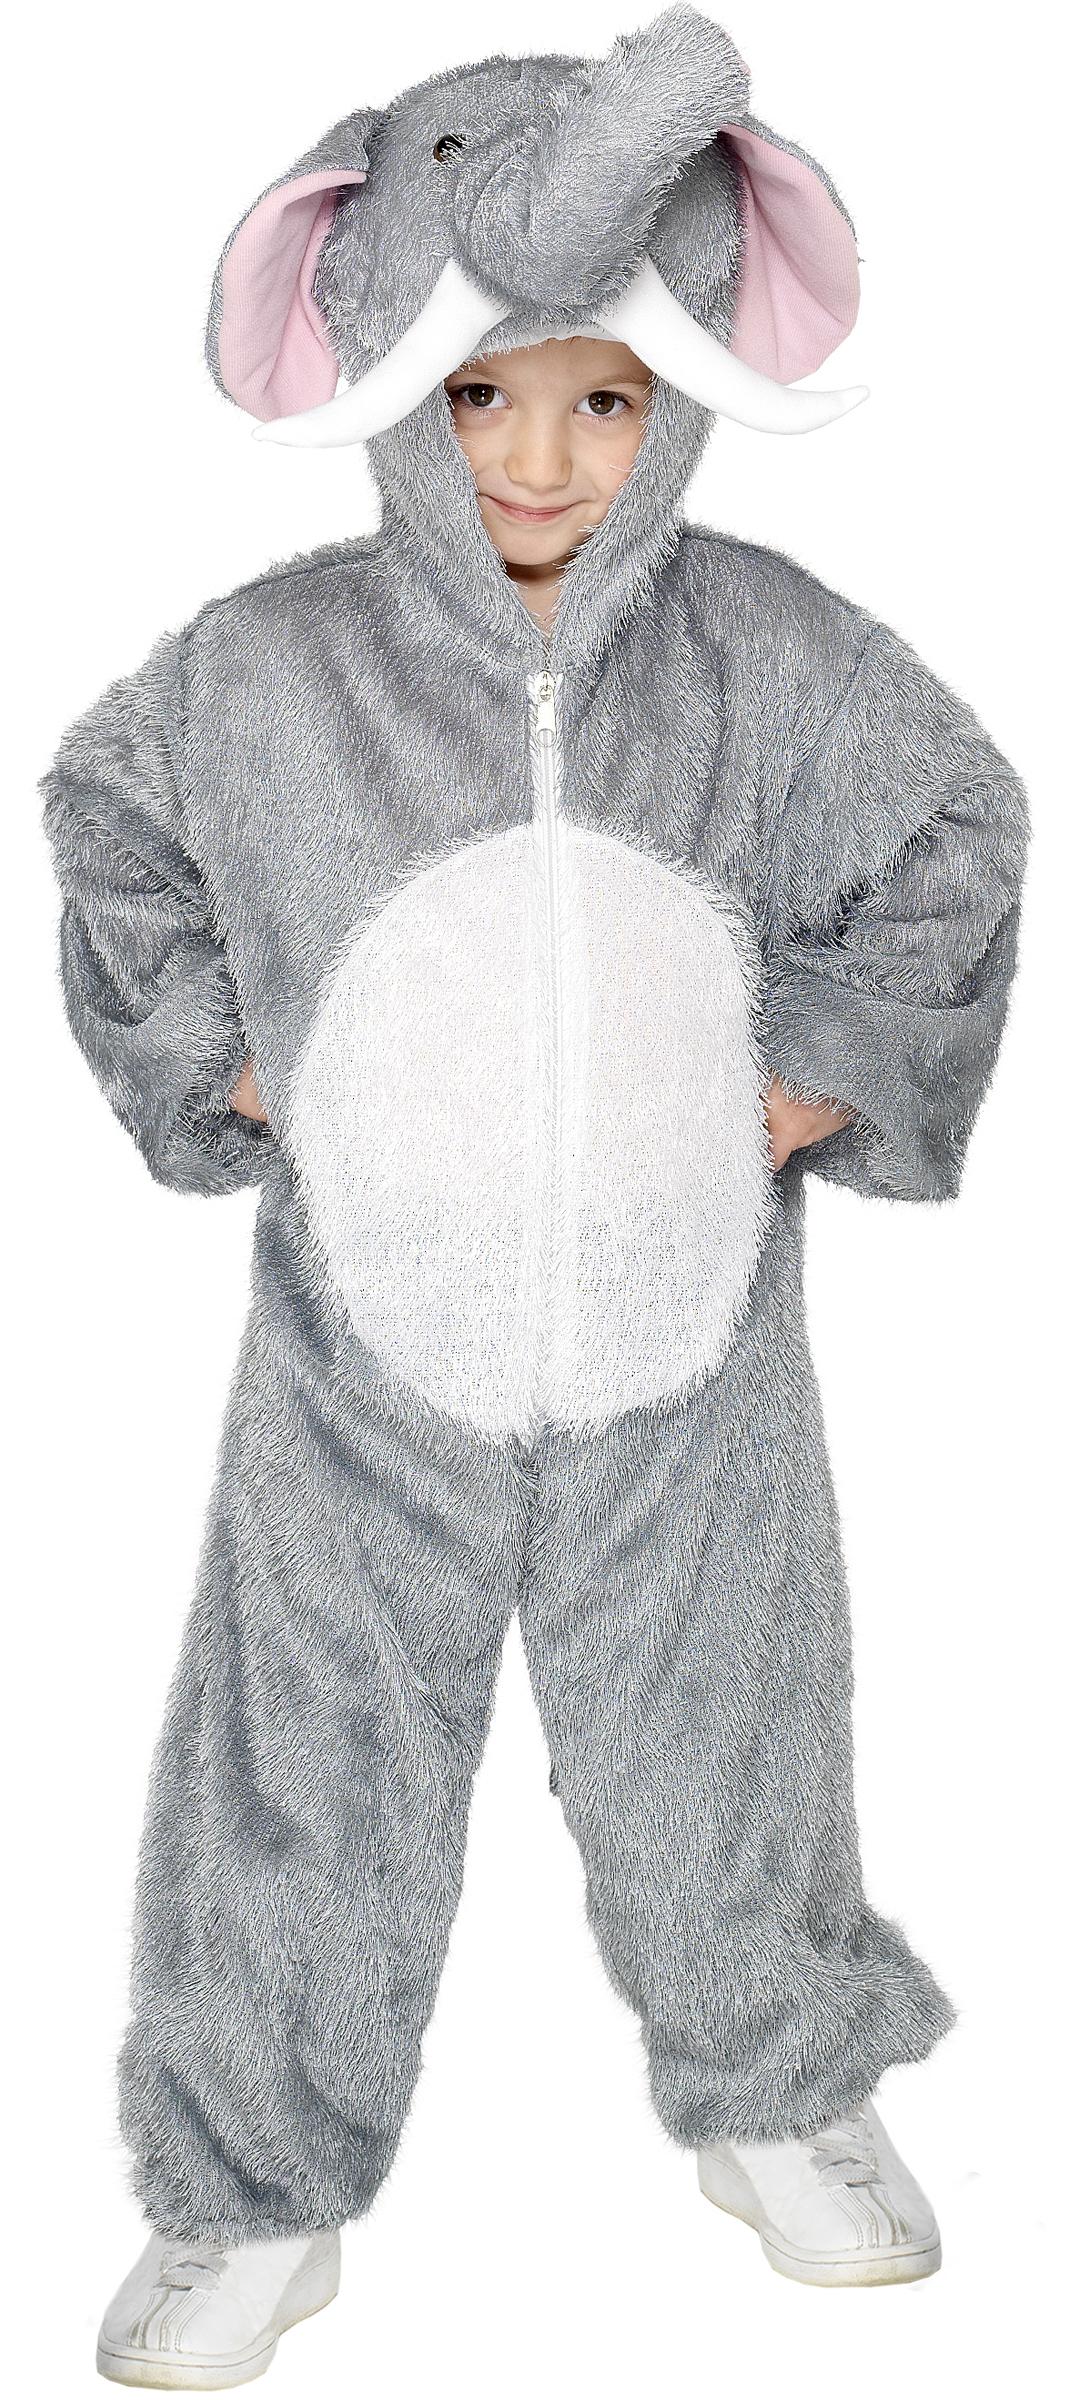 Deguisement-elephant-enfant-Cod-170667